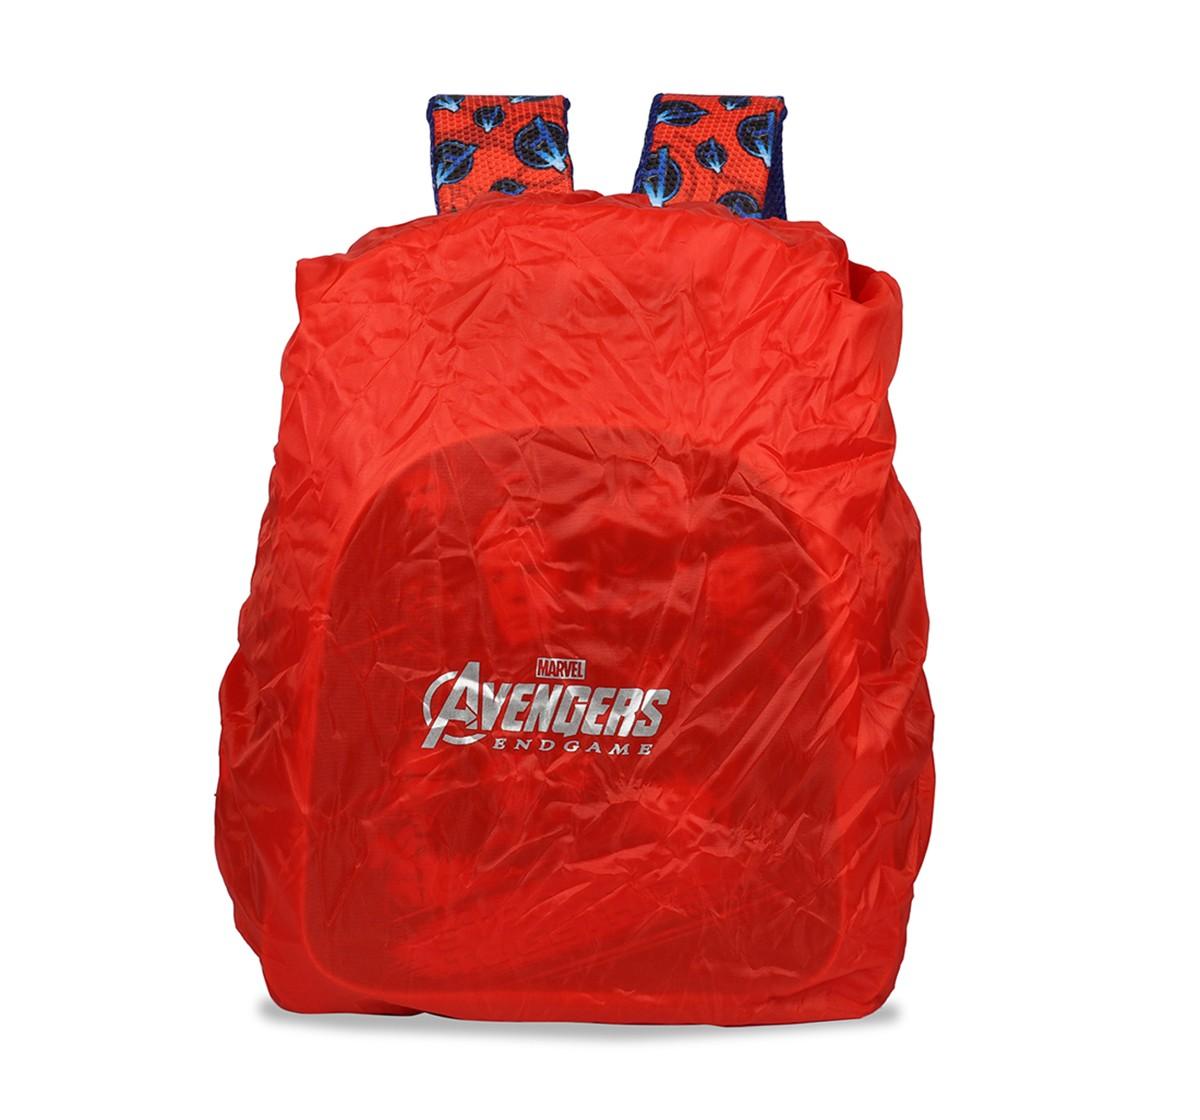 Marvel Avengers Stronger Together Red & Blue School Bag 41 Cm Bags for Boys age 7Y+